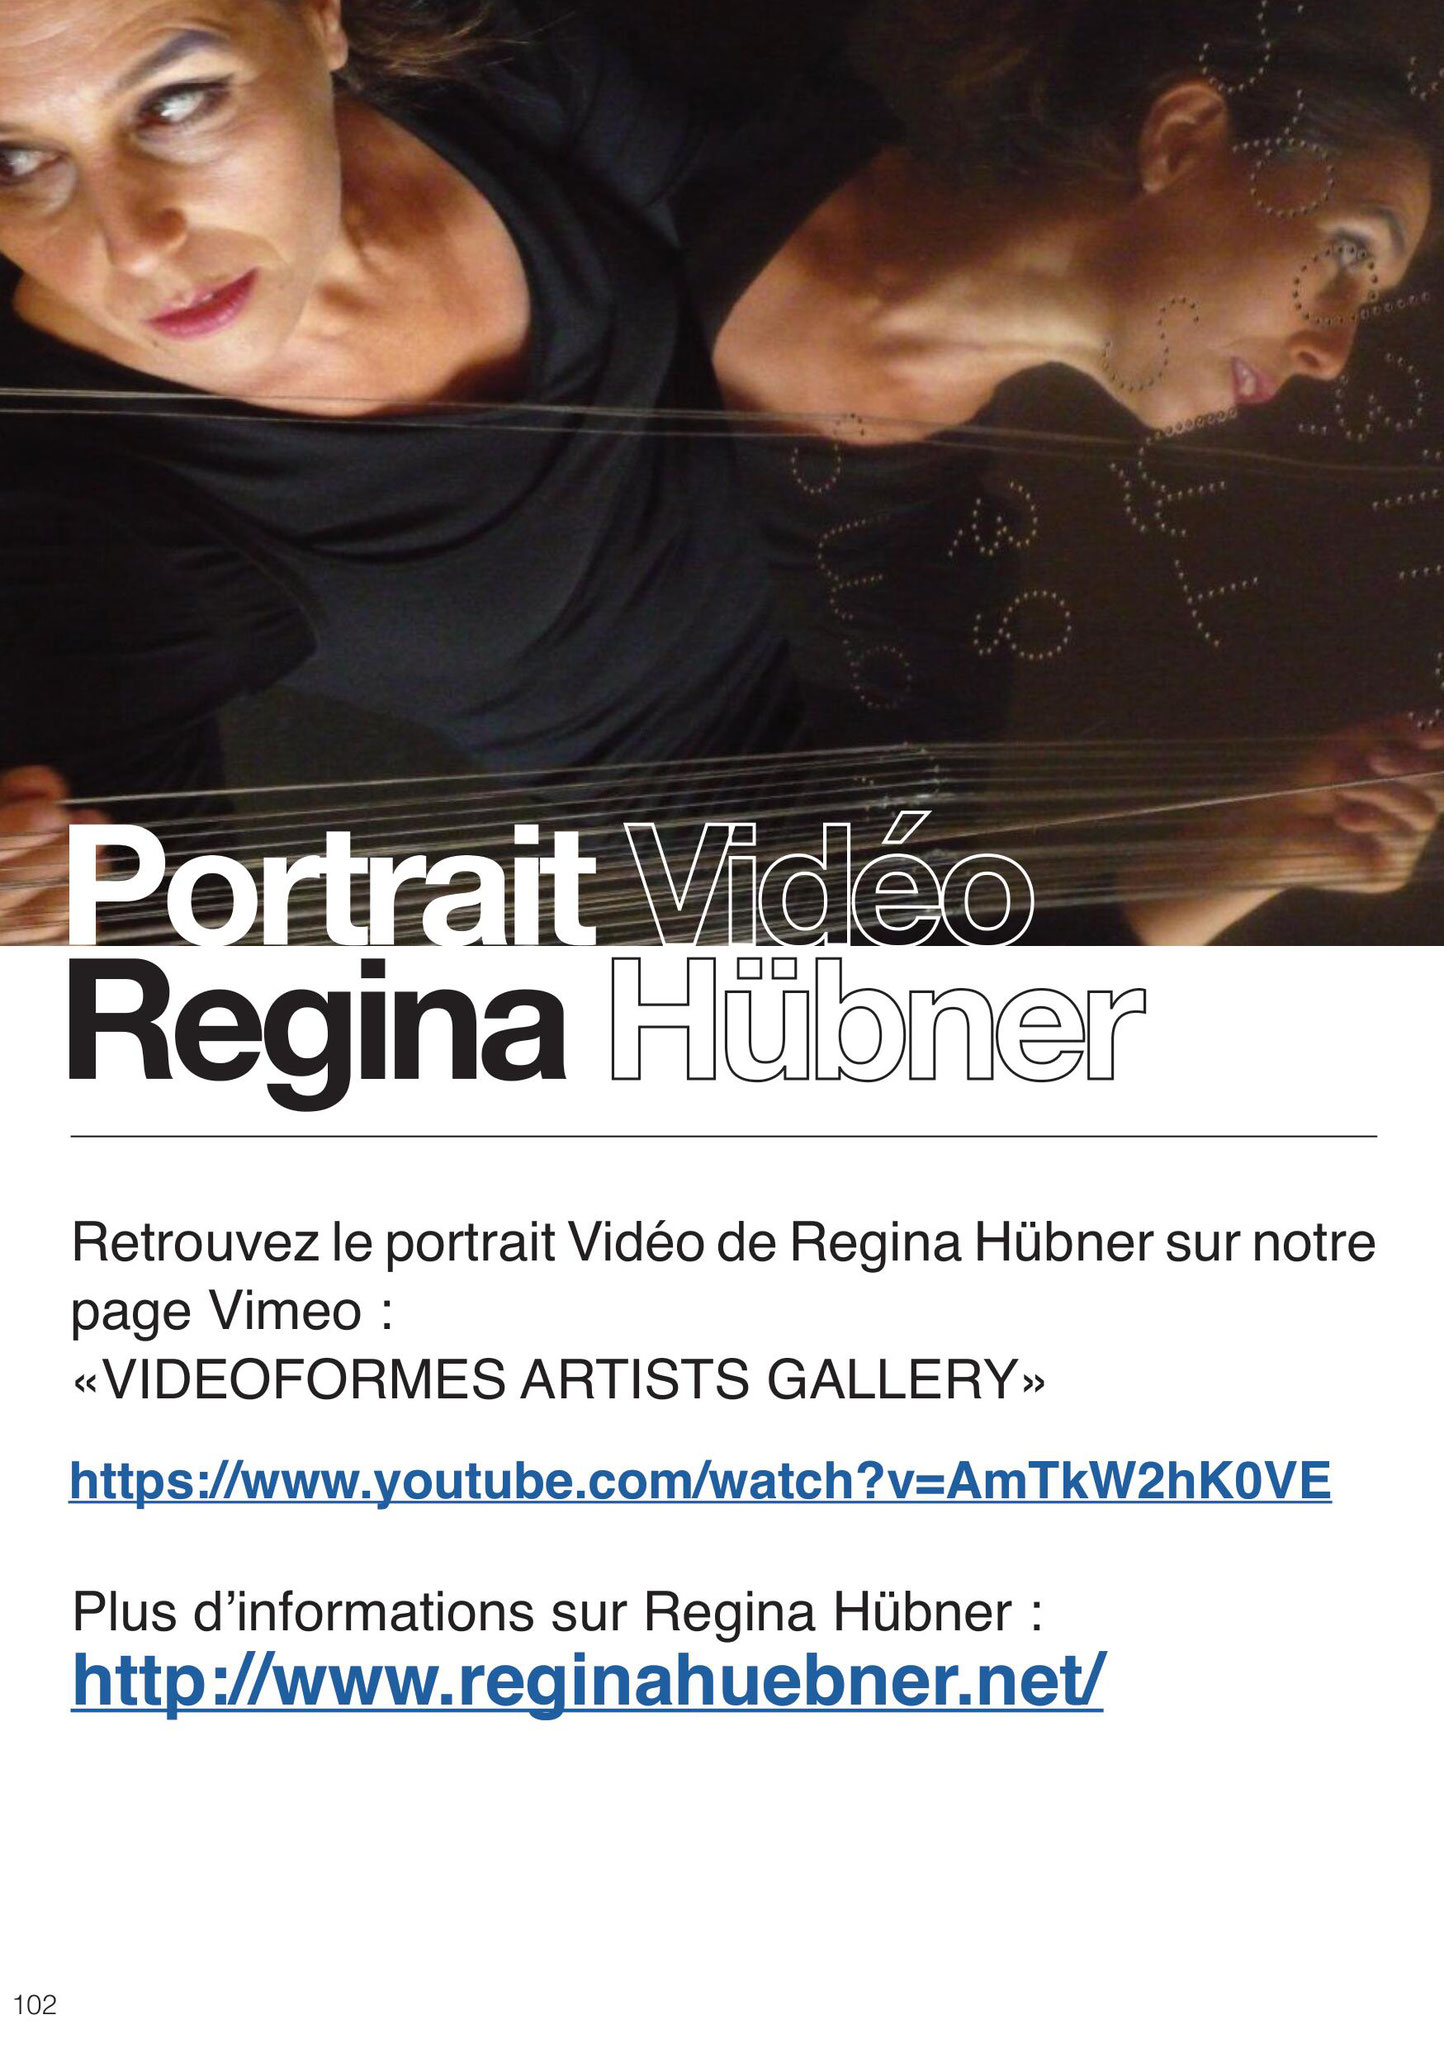 Portrait Vidéo Regina Hübner